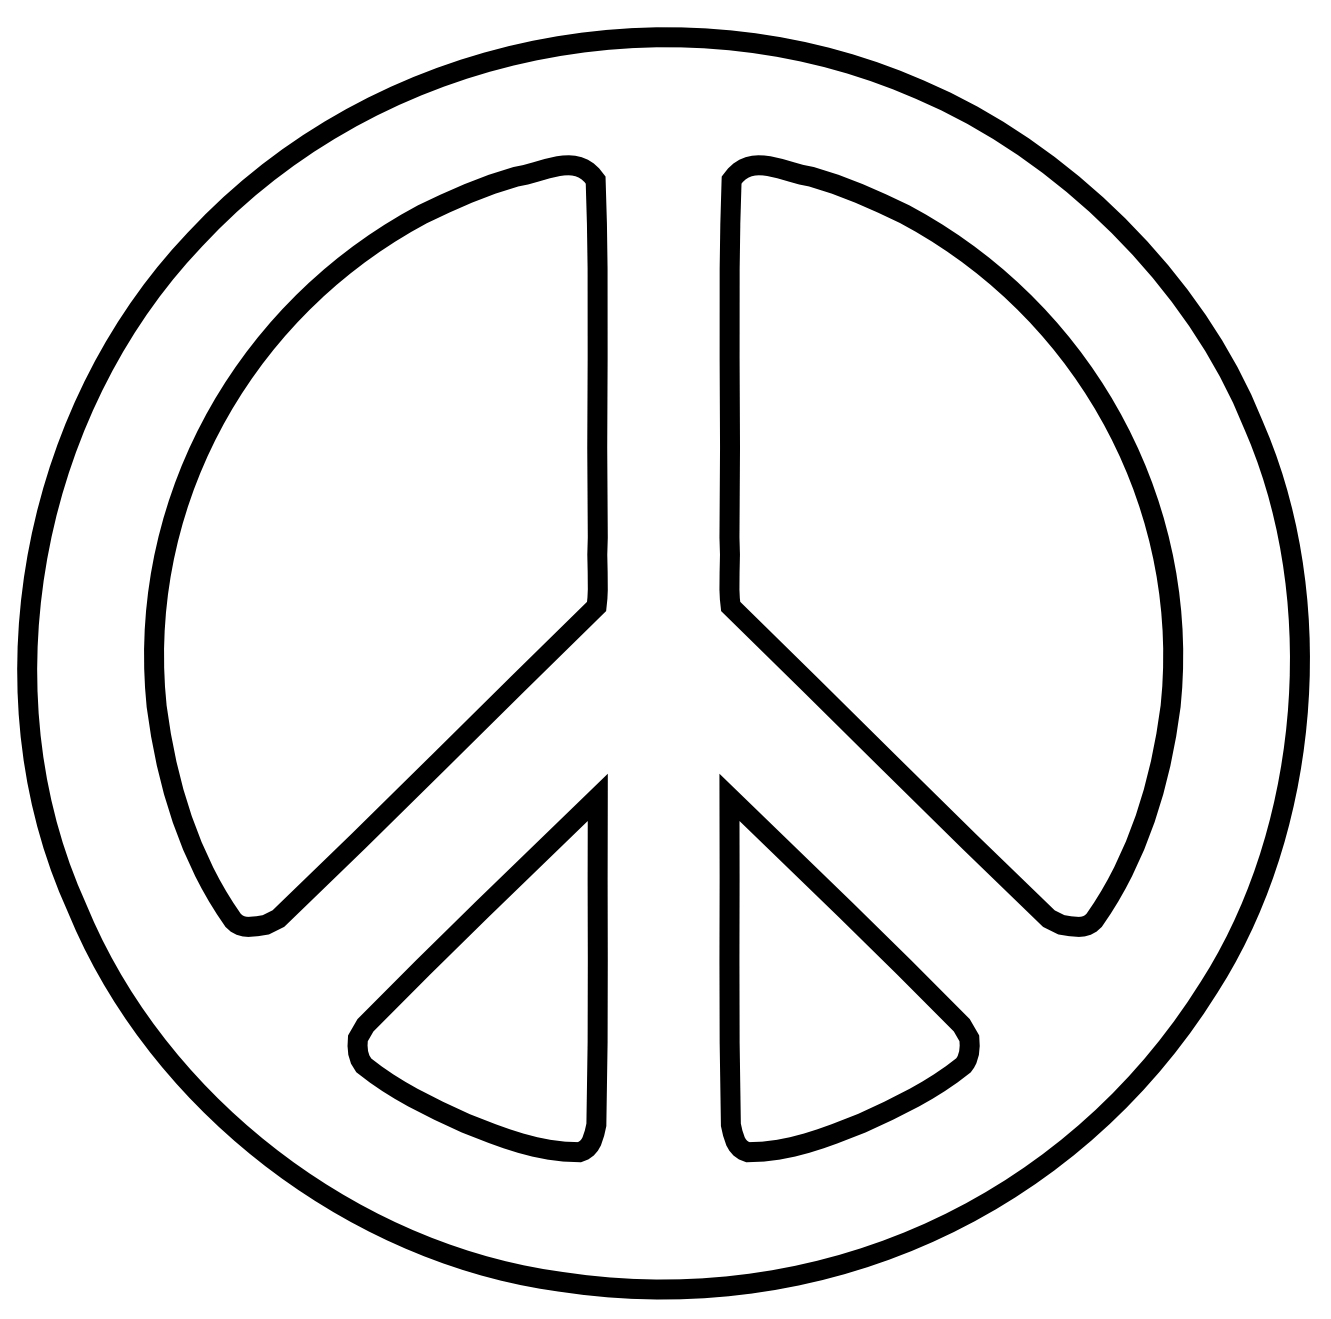 clip art peace signs